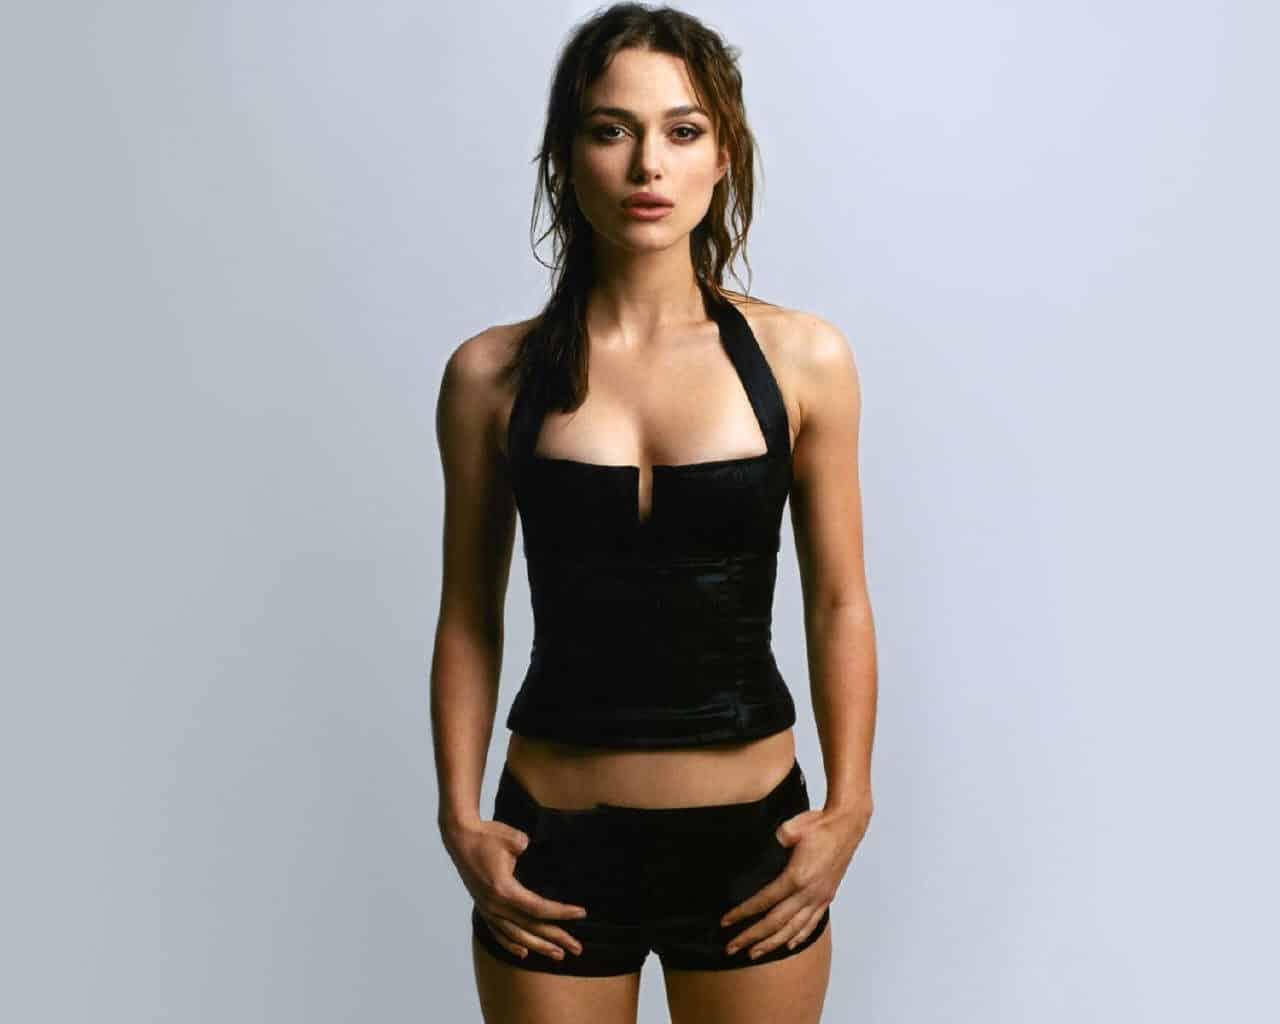 keira-knightley-age-affairs-height-weight-bra-size-body-statistics-3